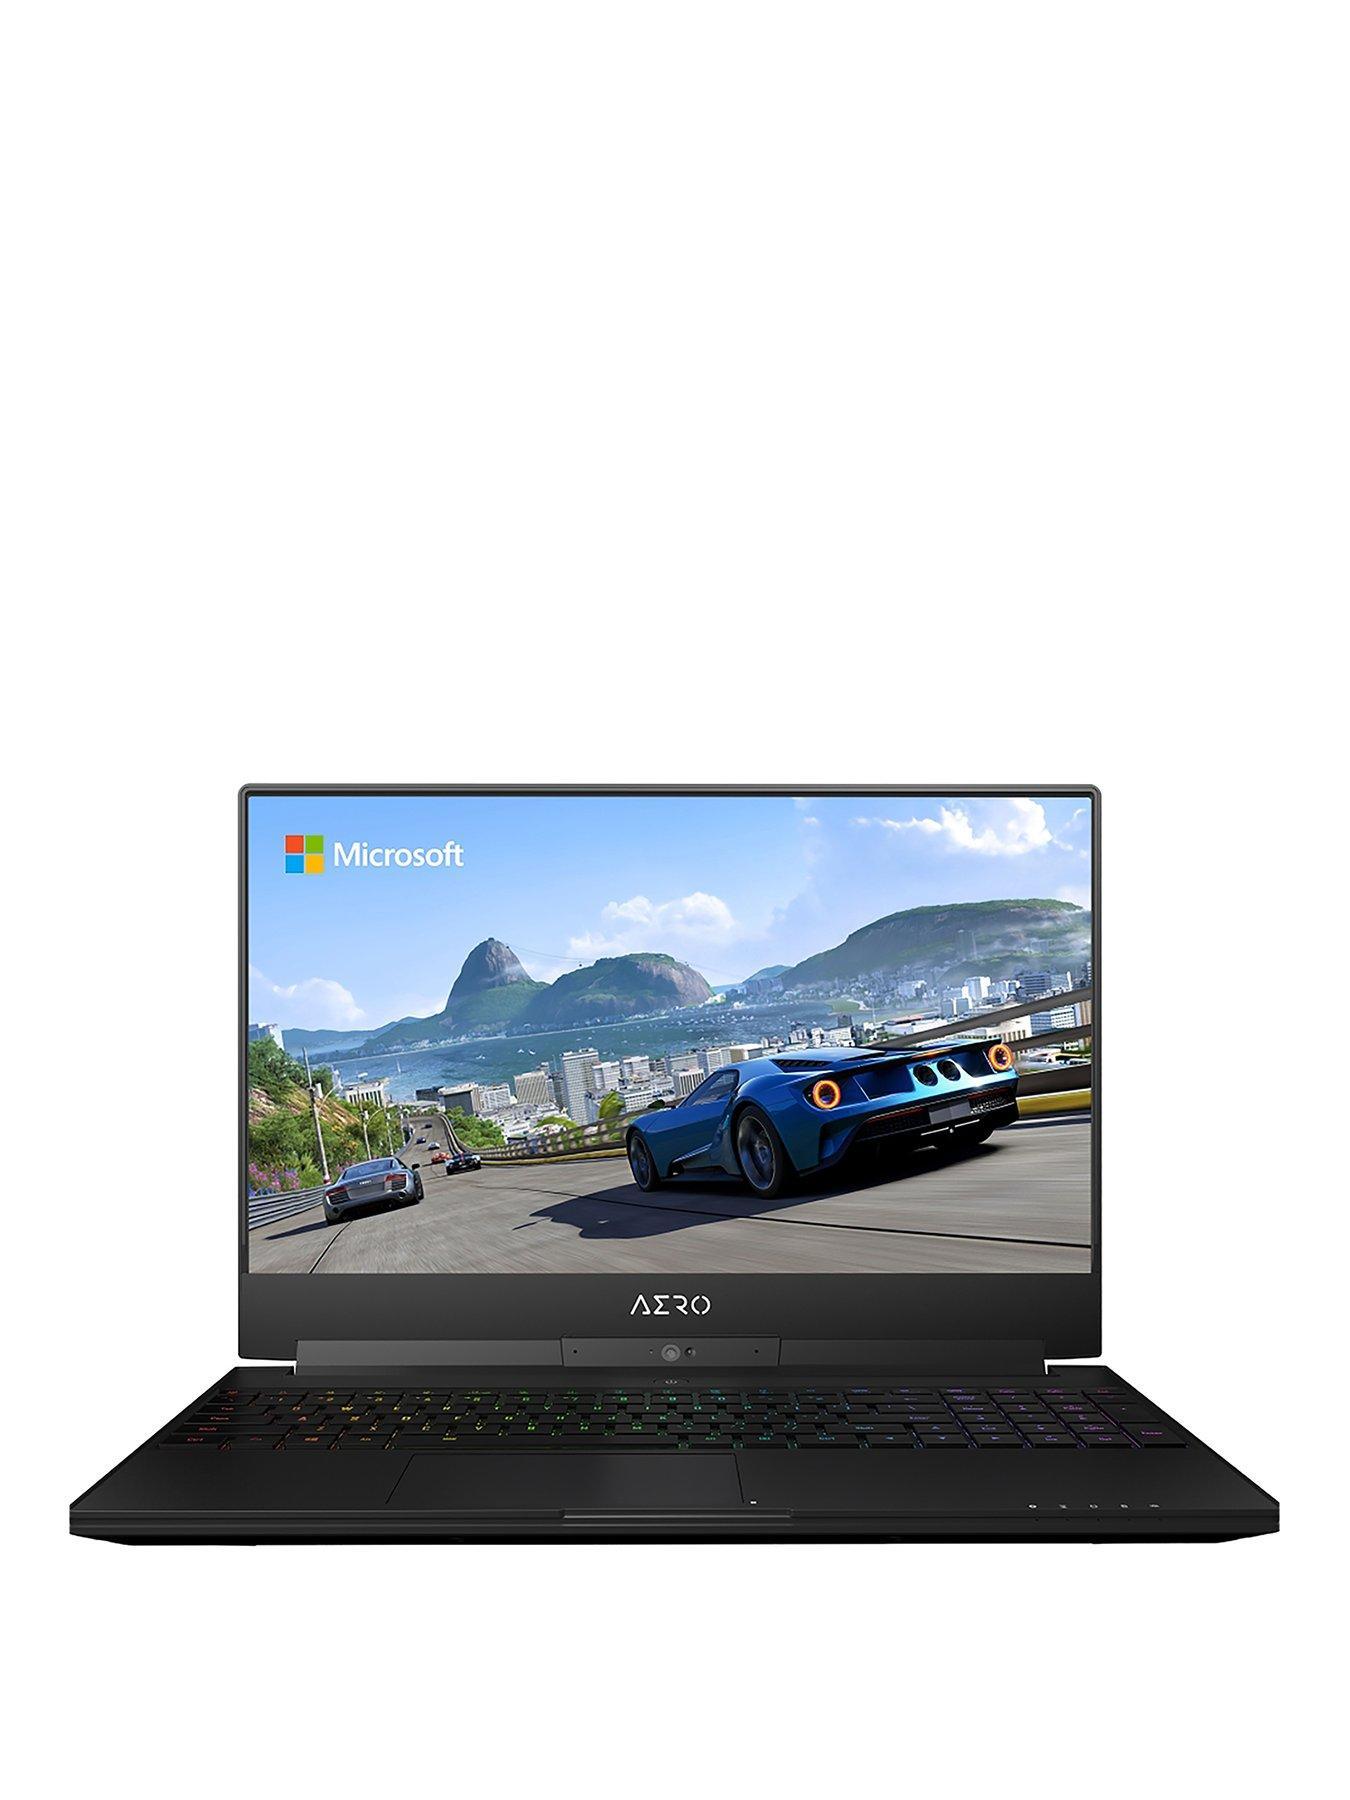 GIGABYTE AERO 15X FHD 144Hz, VR Ready, Intel® Core™ i7 8750H, GeForce GTX 1070 8GbMaxQ, 512GbPCIe SSD, 16GbRAM,15.6 inchGaming Laptop + Call of Duty Black Ops 4